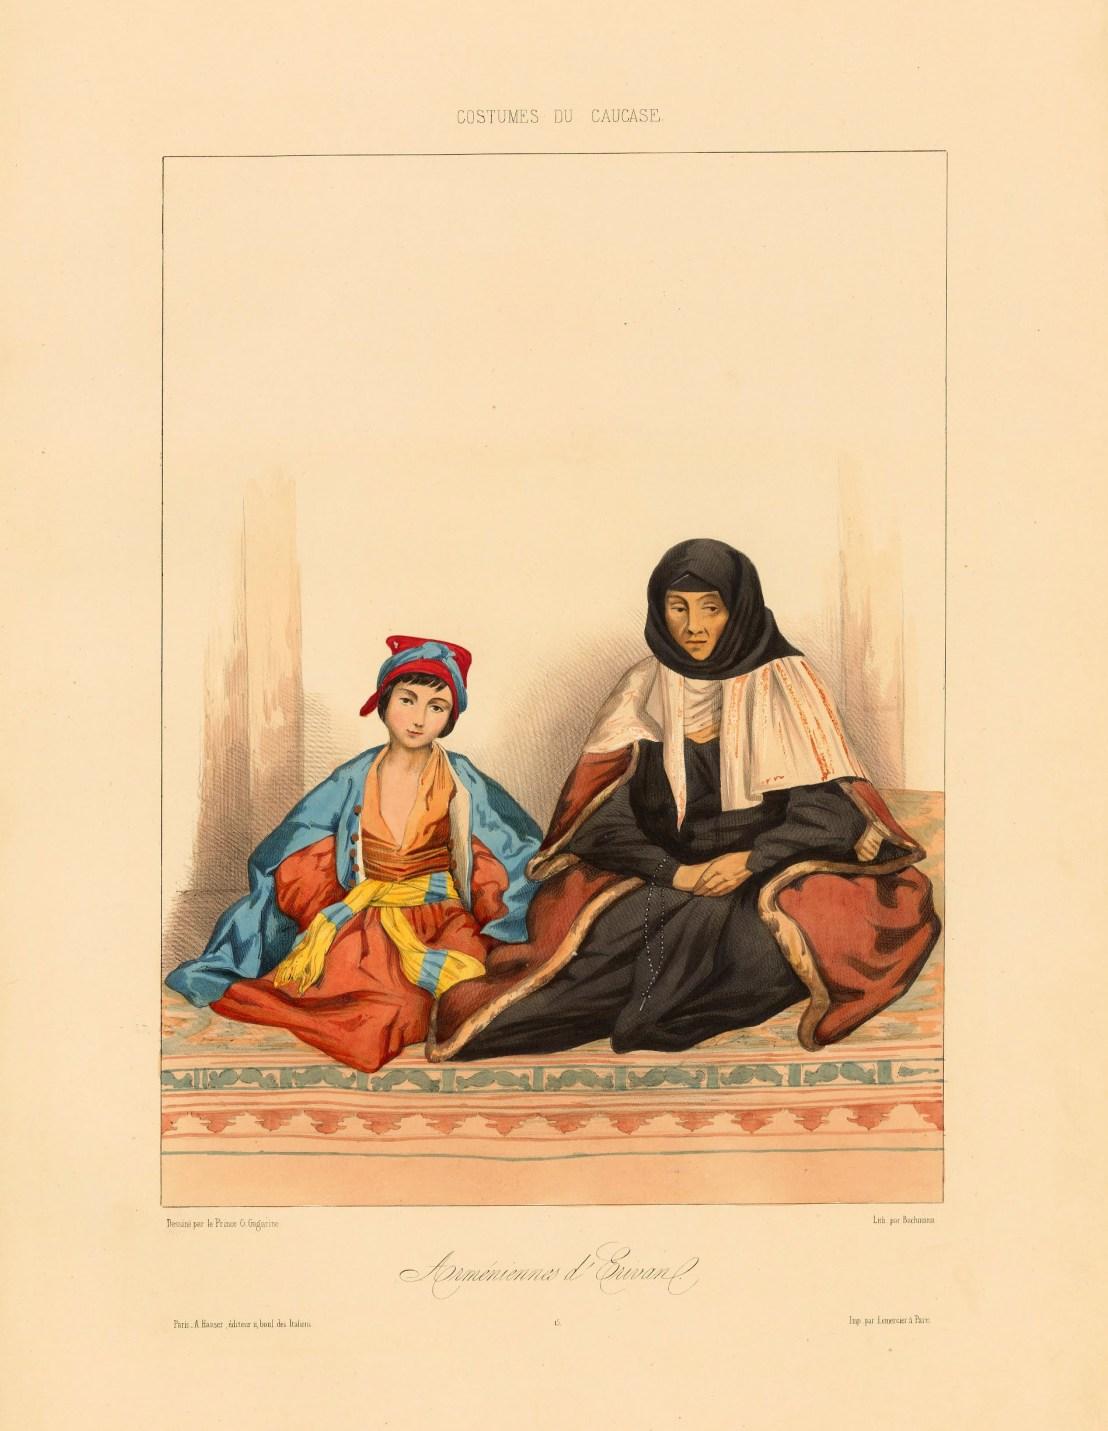 Family from Armenia in Tiflis, by Grigory Gagarin 1850-1855